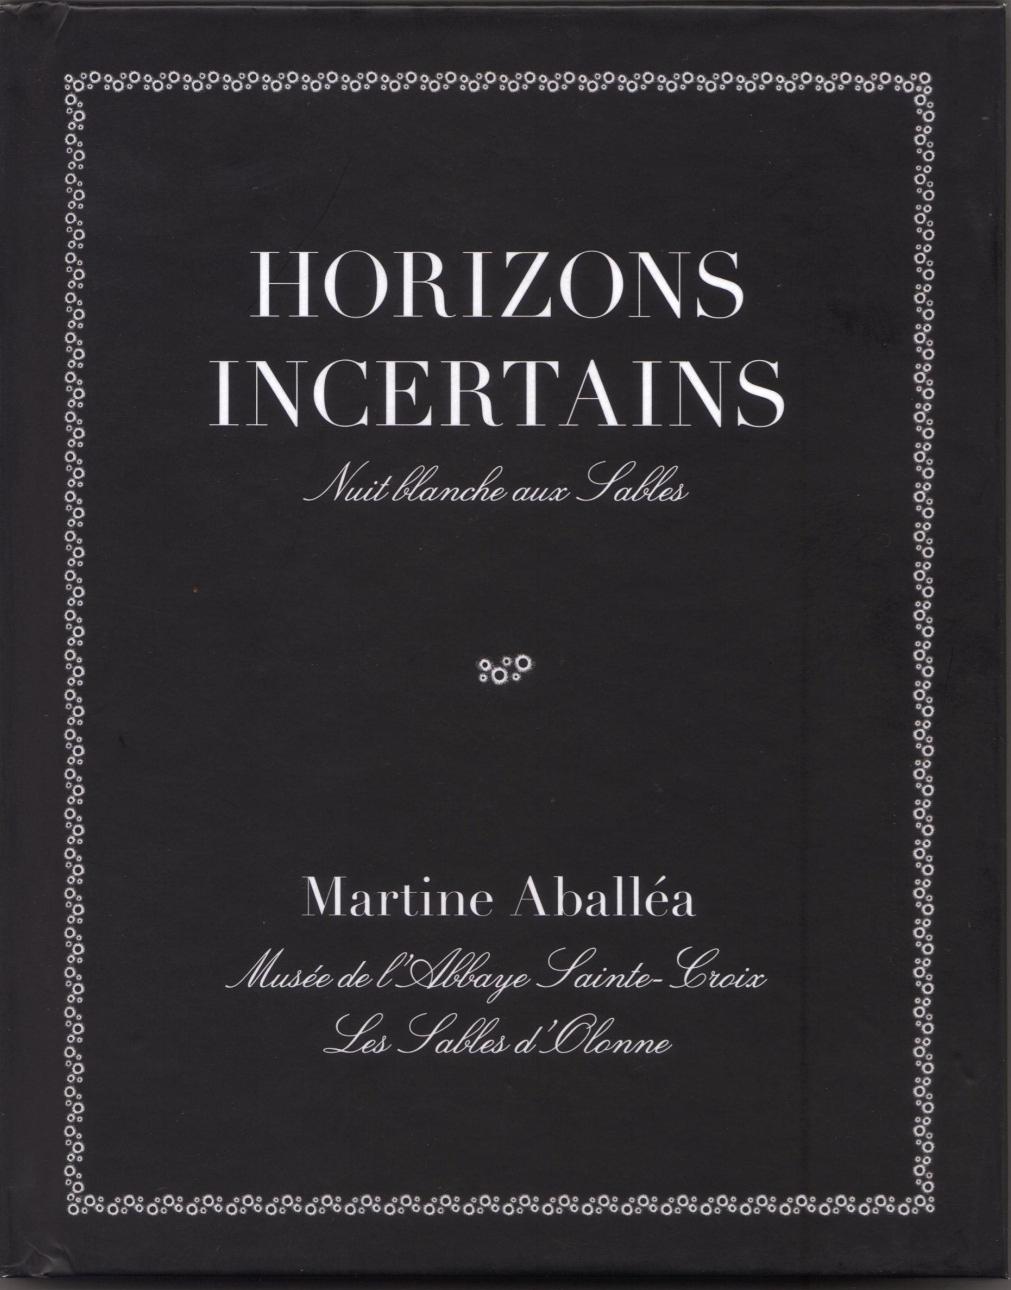 Horizons Incertains